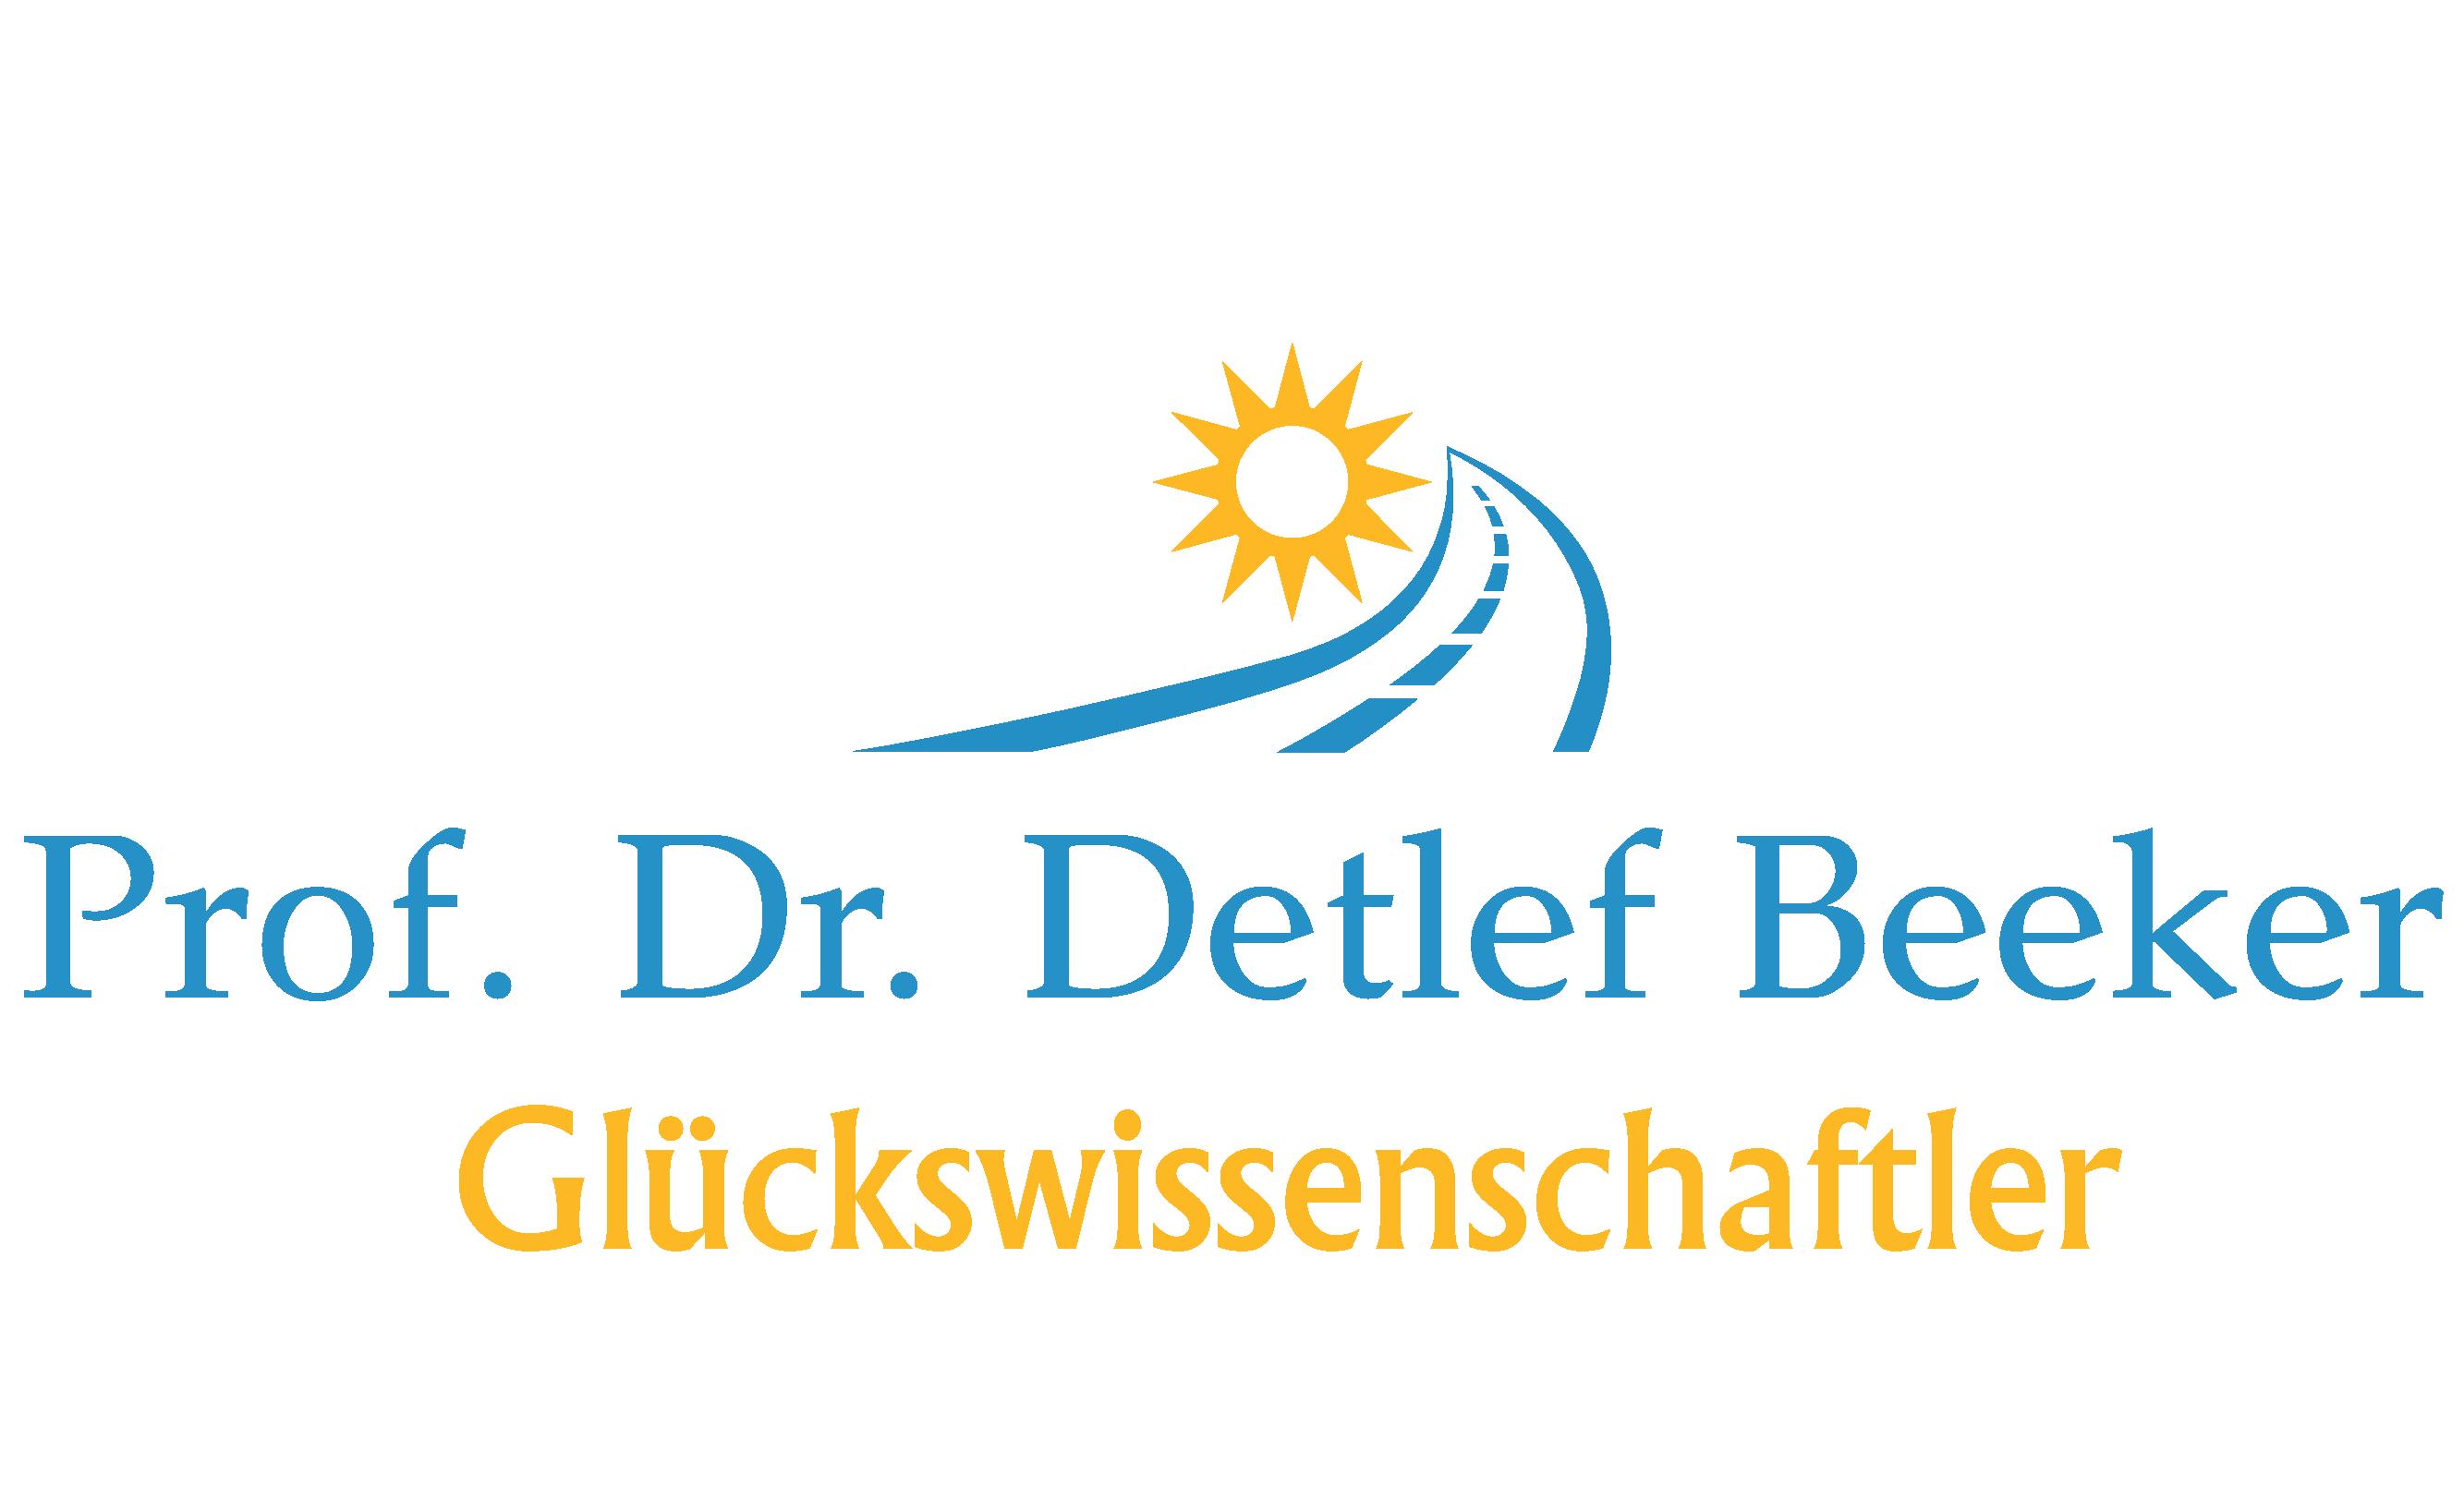 Prof. Dr. Detlef Beeker